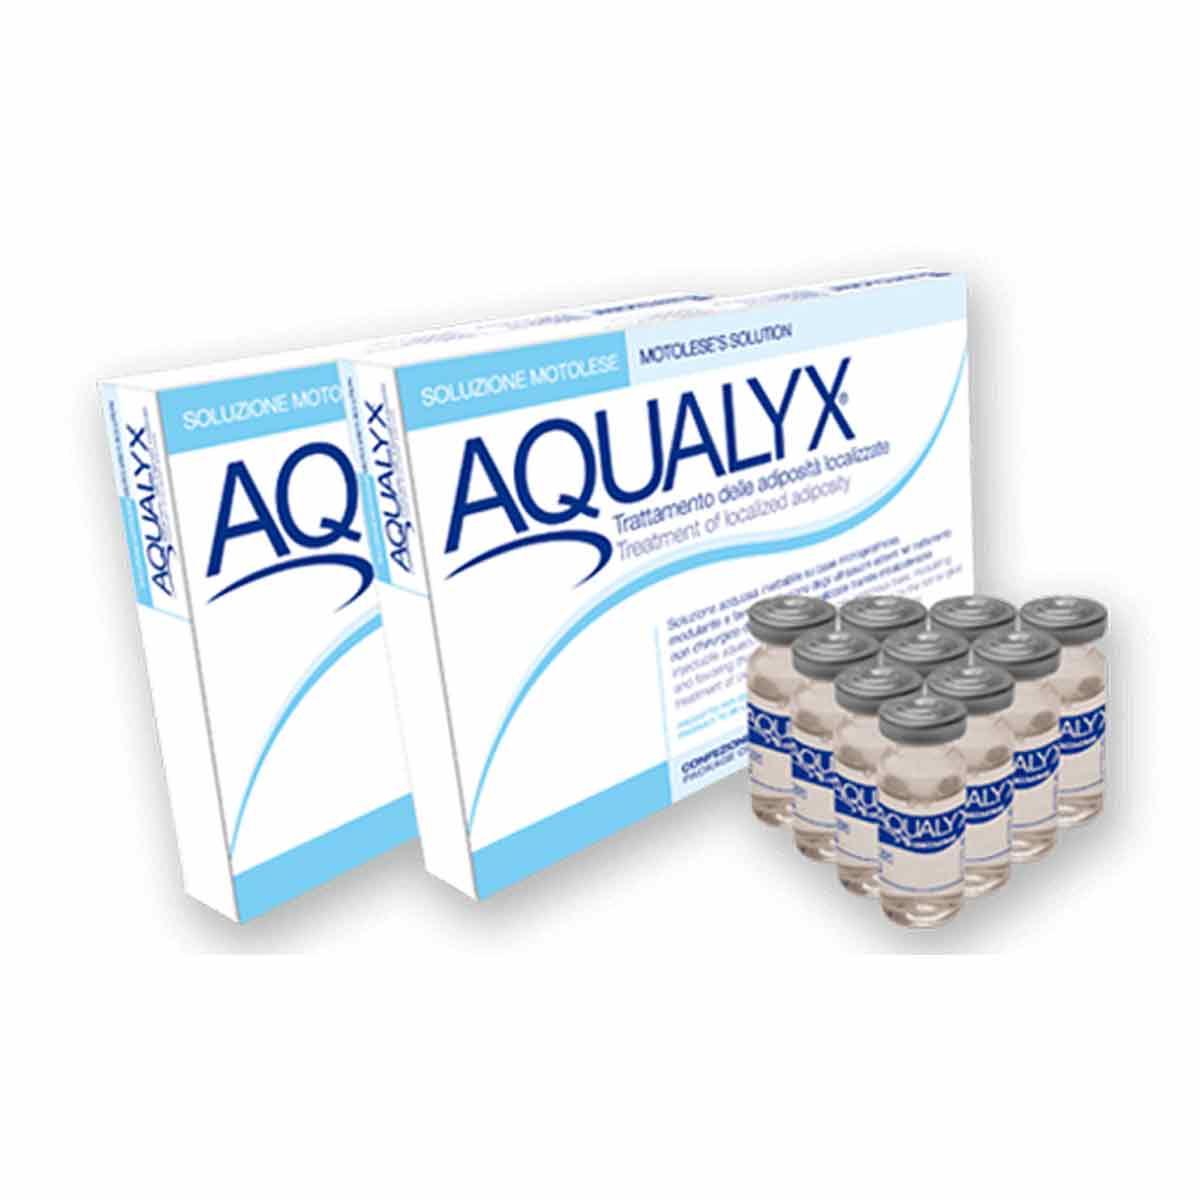 aqualyx slimming kolme jogede kaalulangus